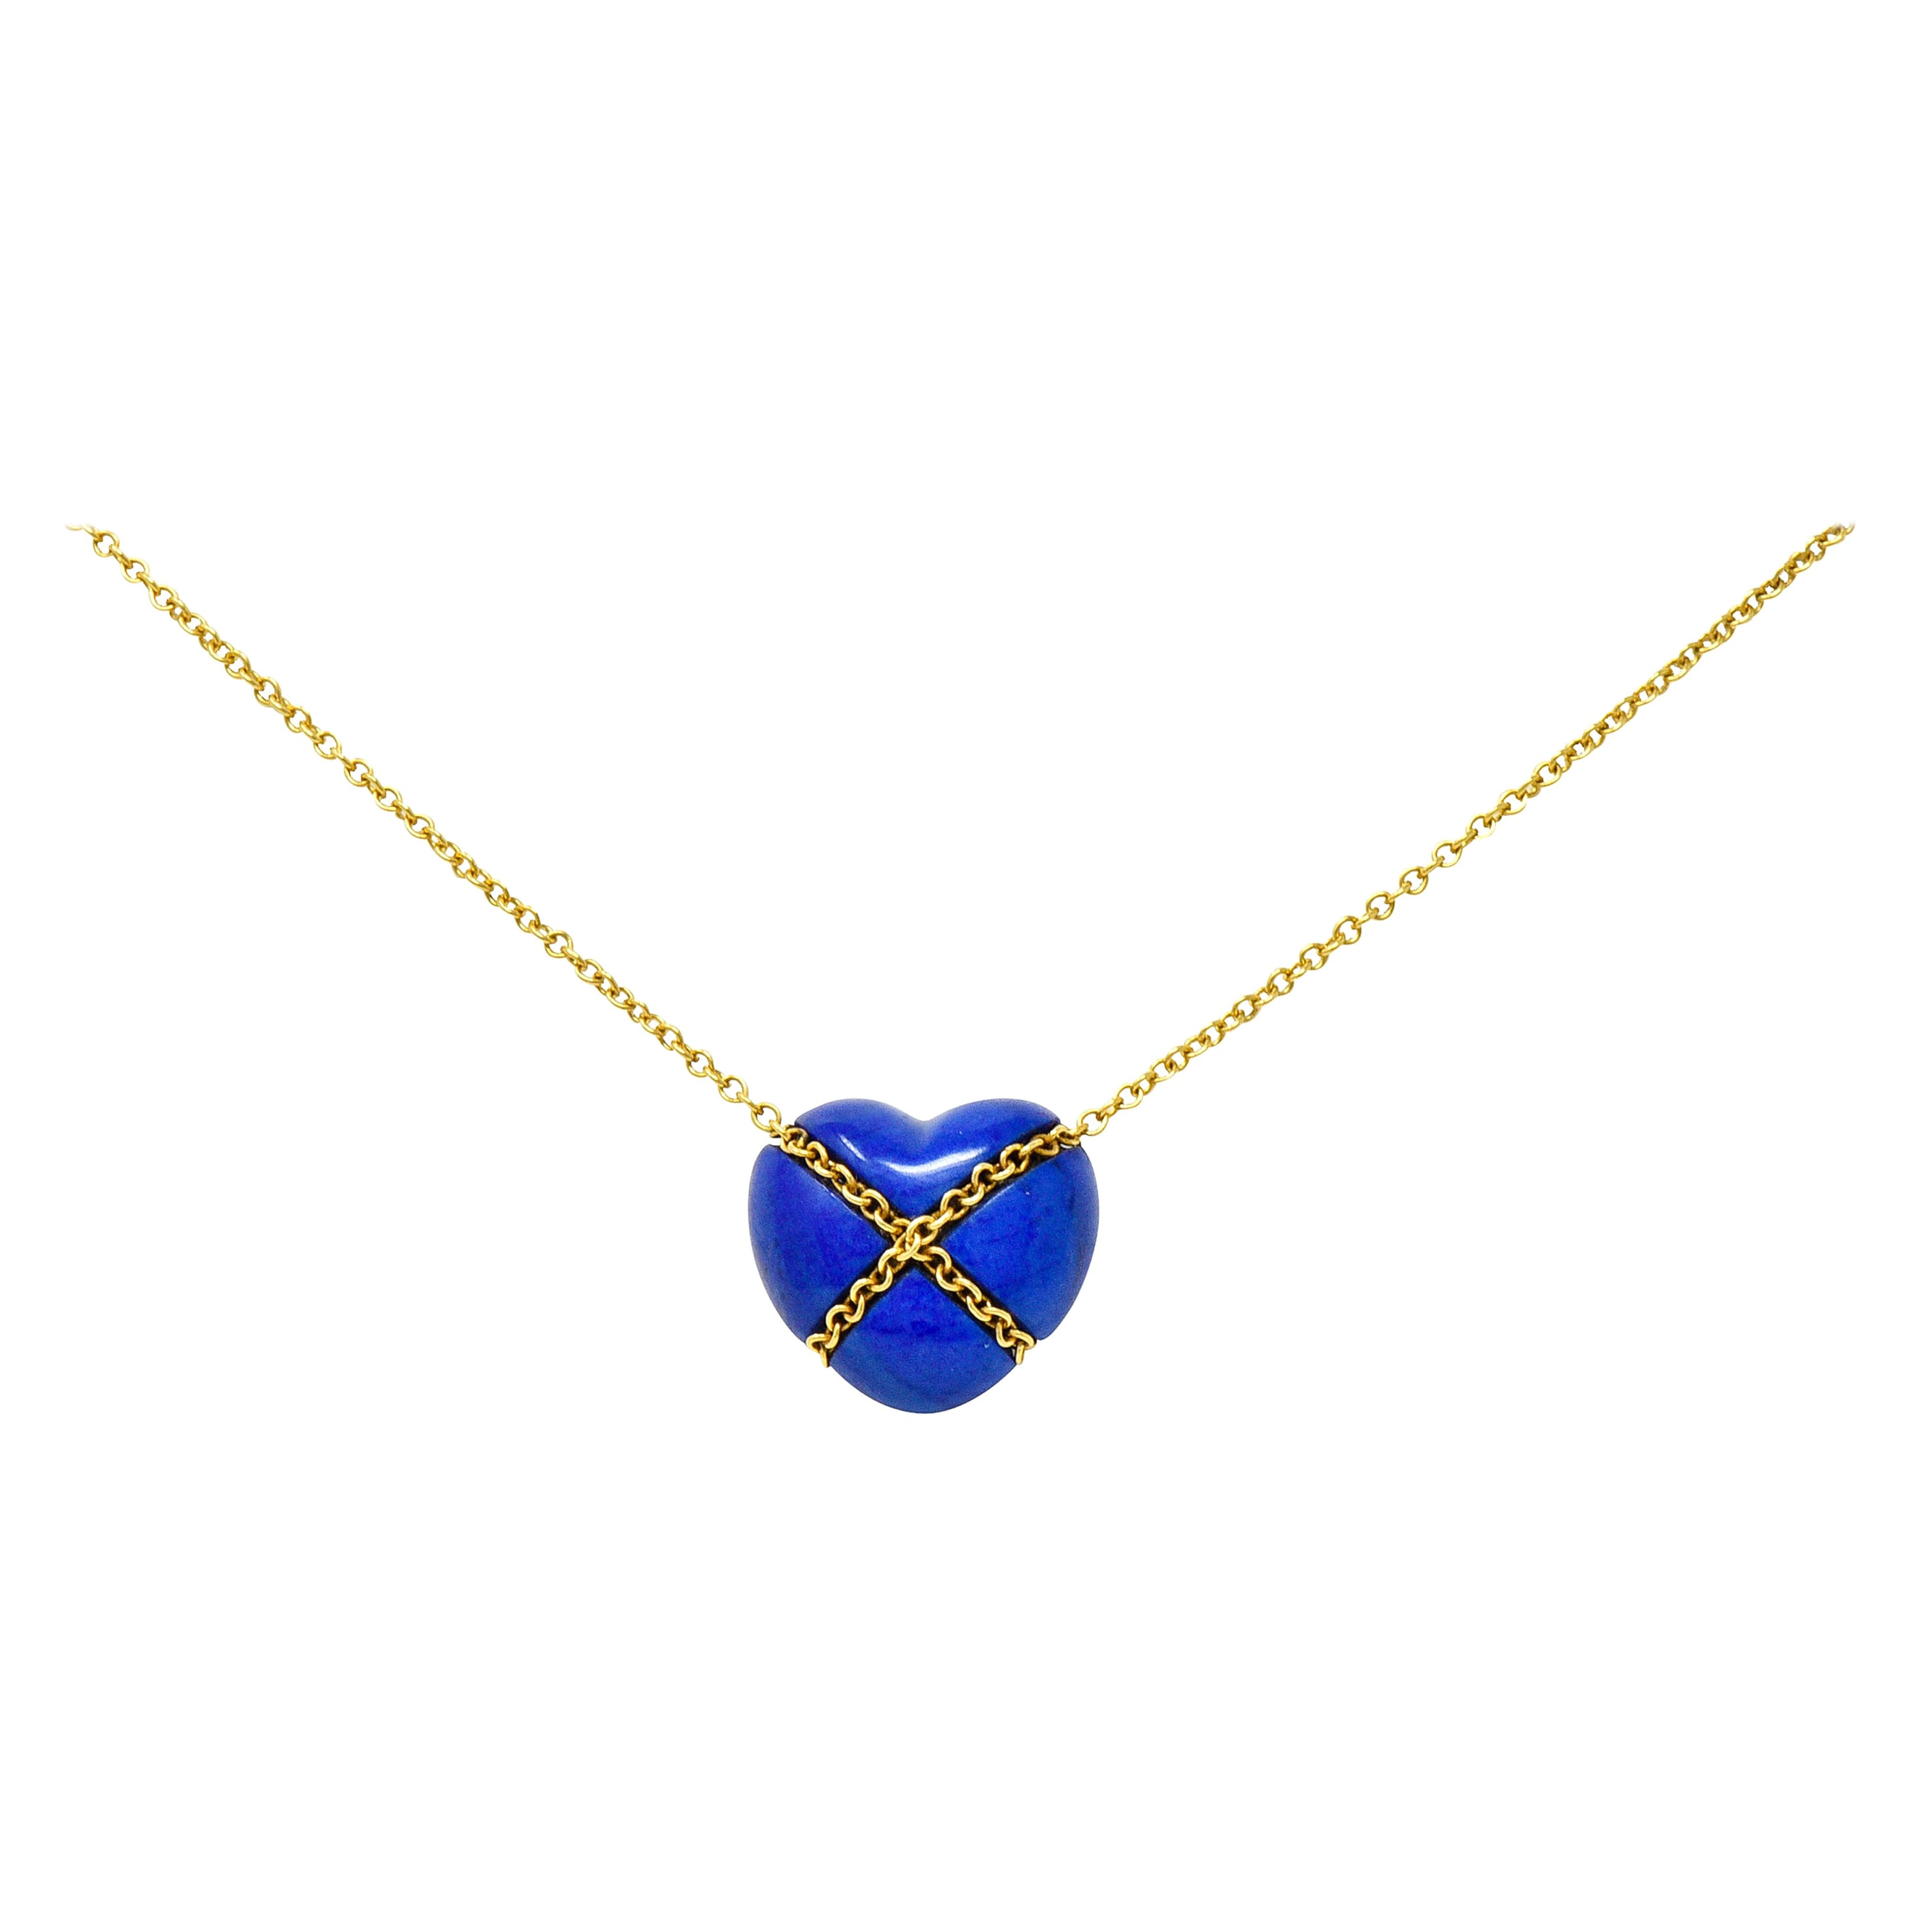 Tiffany & Co. Lapis Lazuli 18 Karat Gold Cross My Heart Necklace